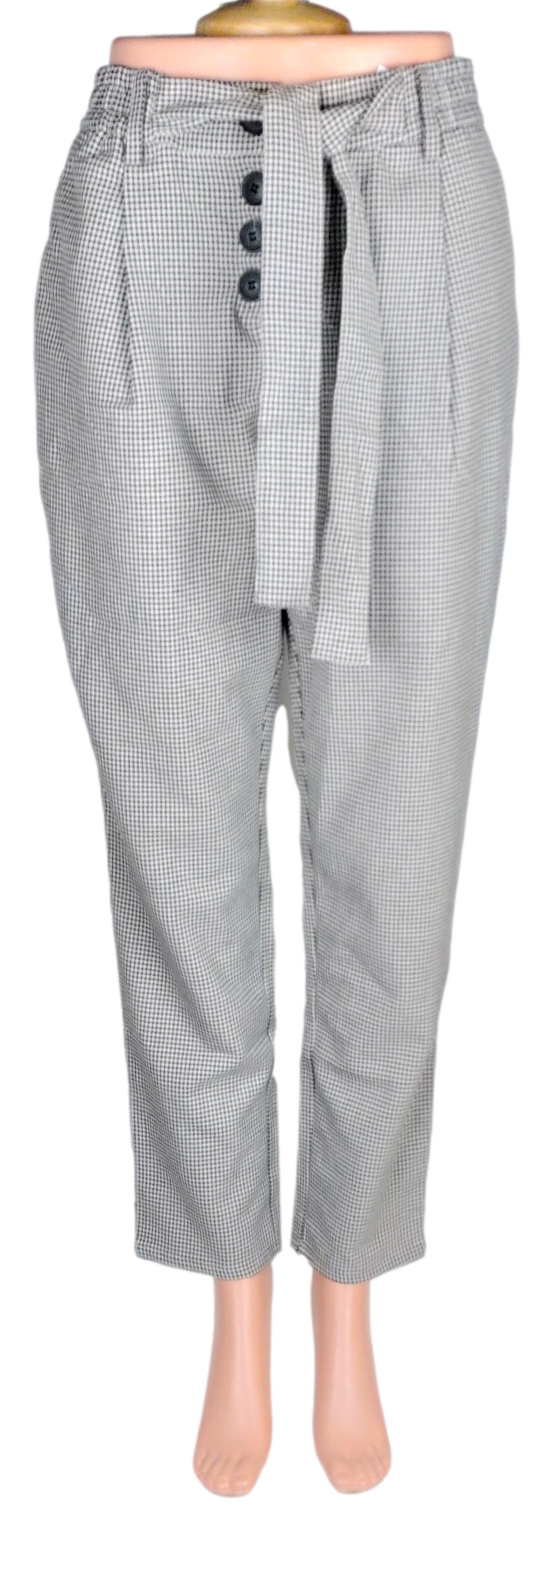 Pantalon Kiabi - Taille 38